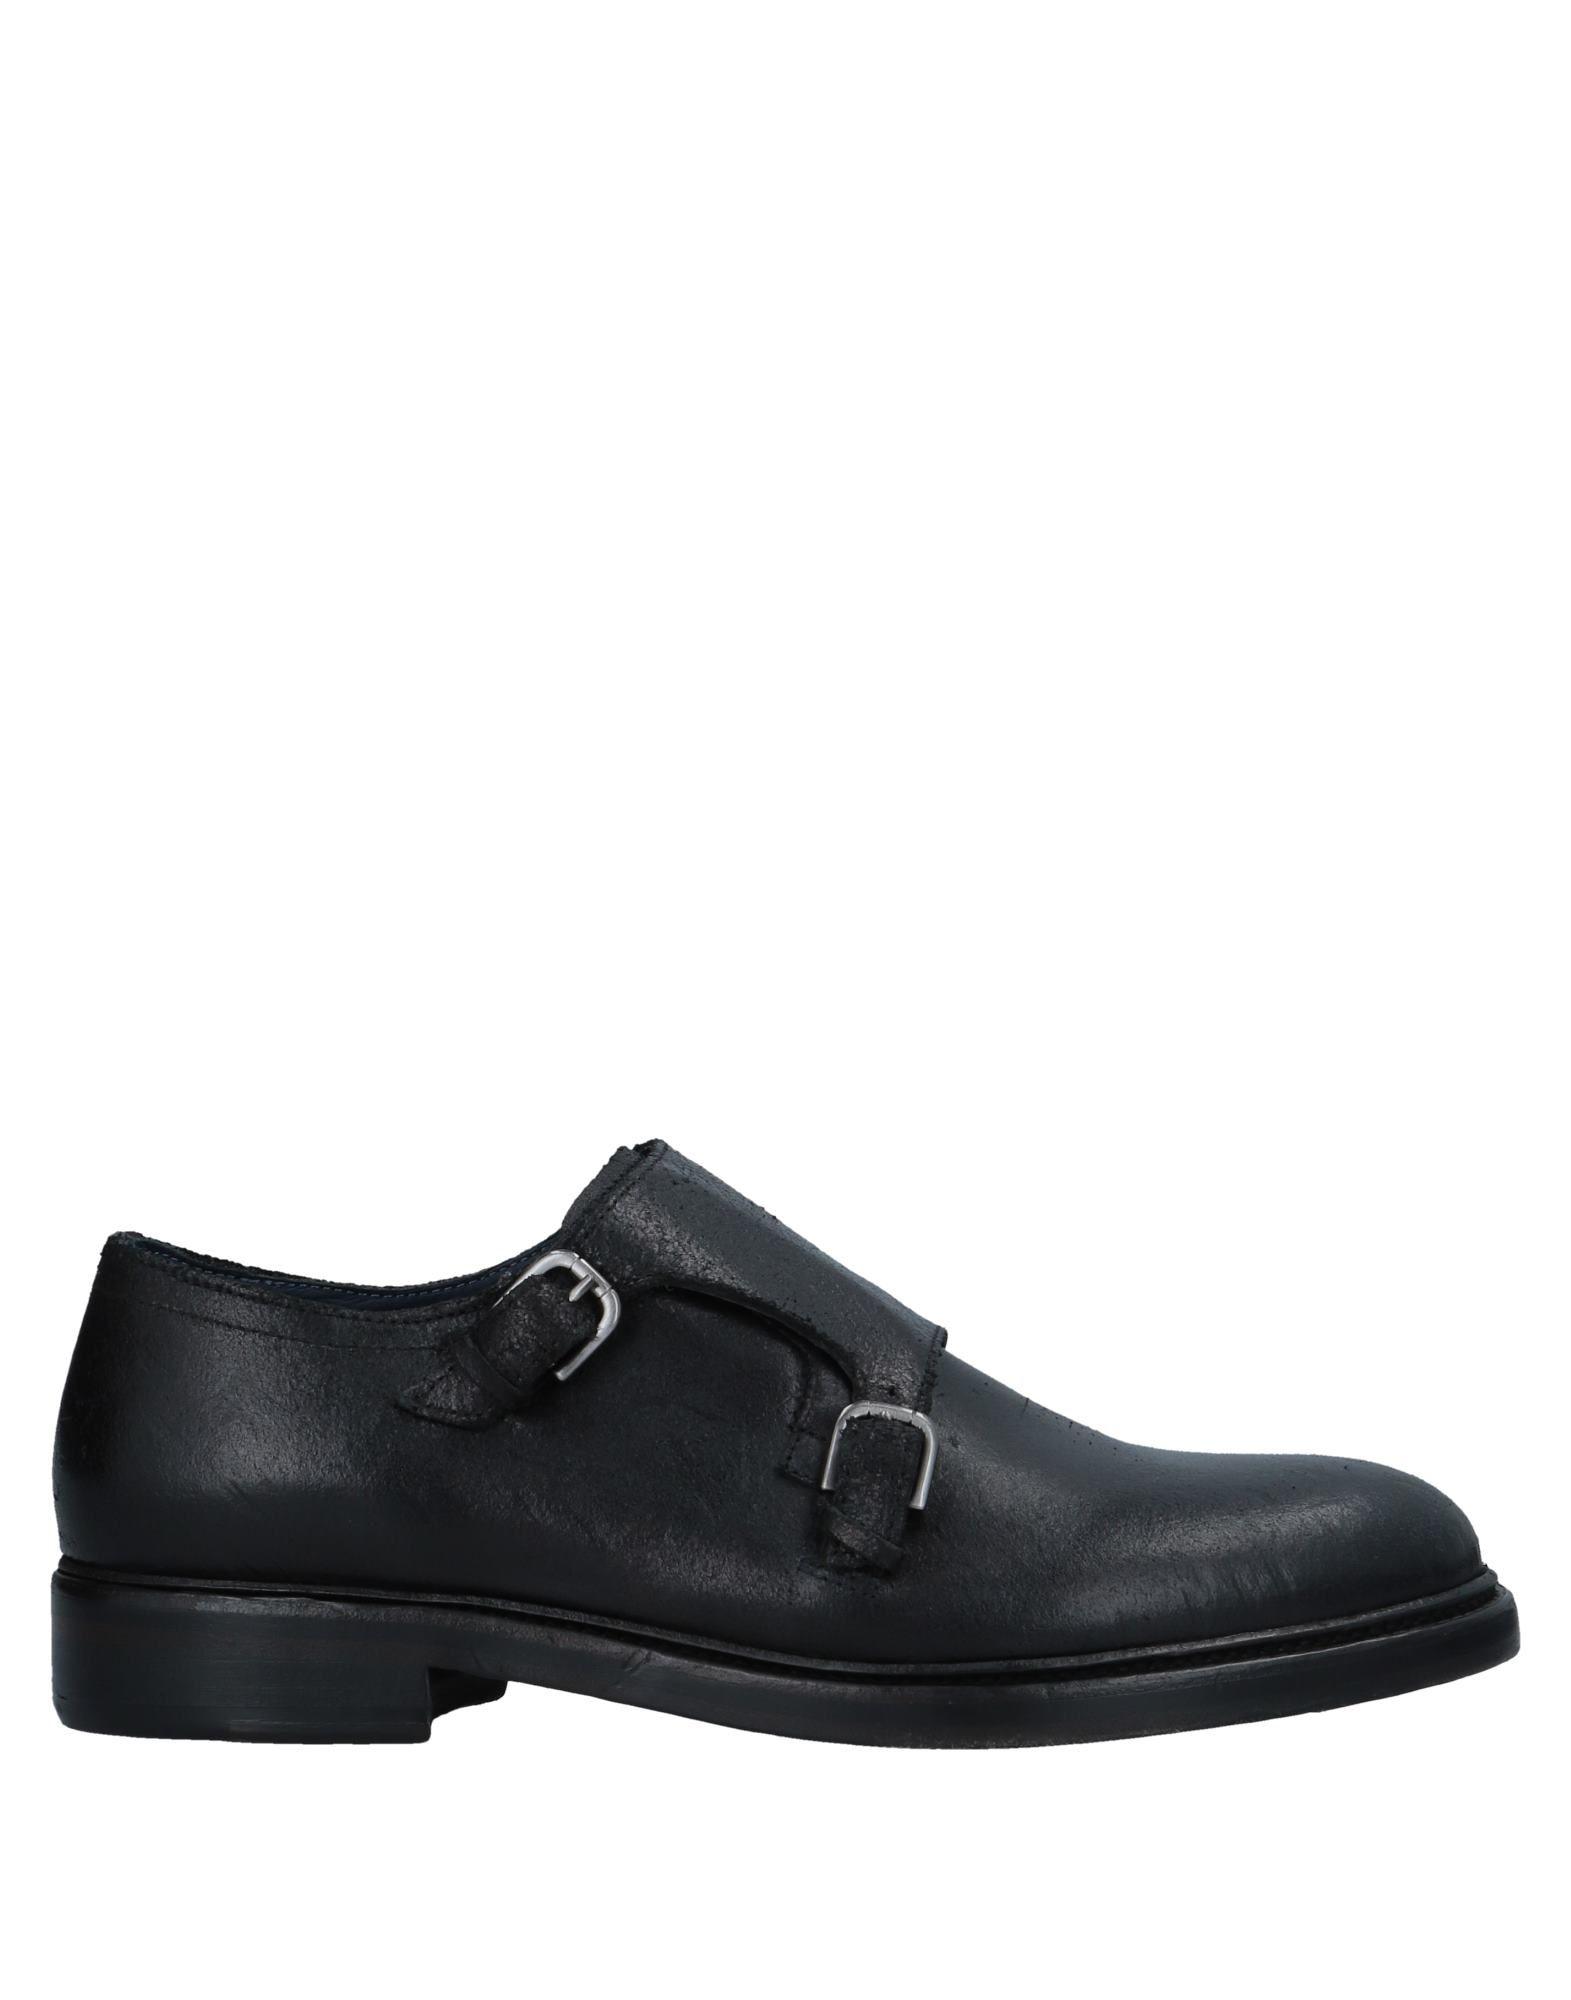 Creation Of Minds Mokassins Herren  11500640BR Gute Qualität beliebte Schuhe